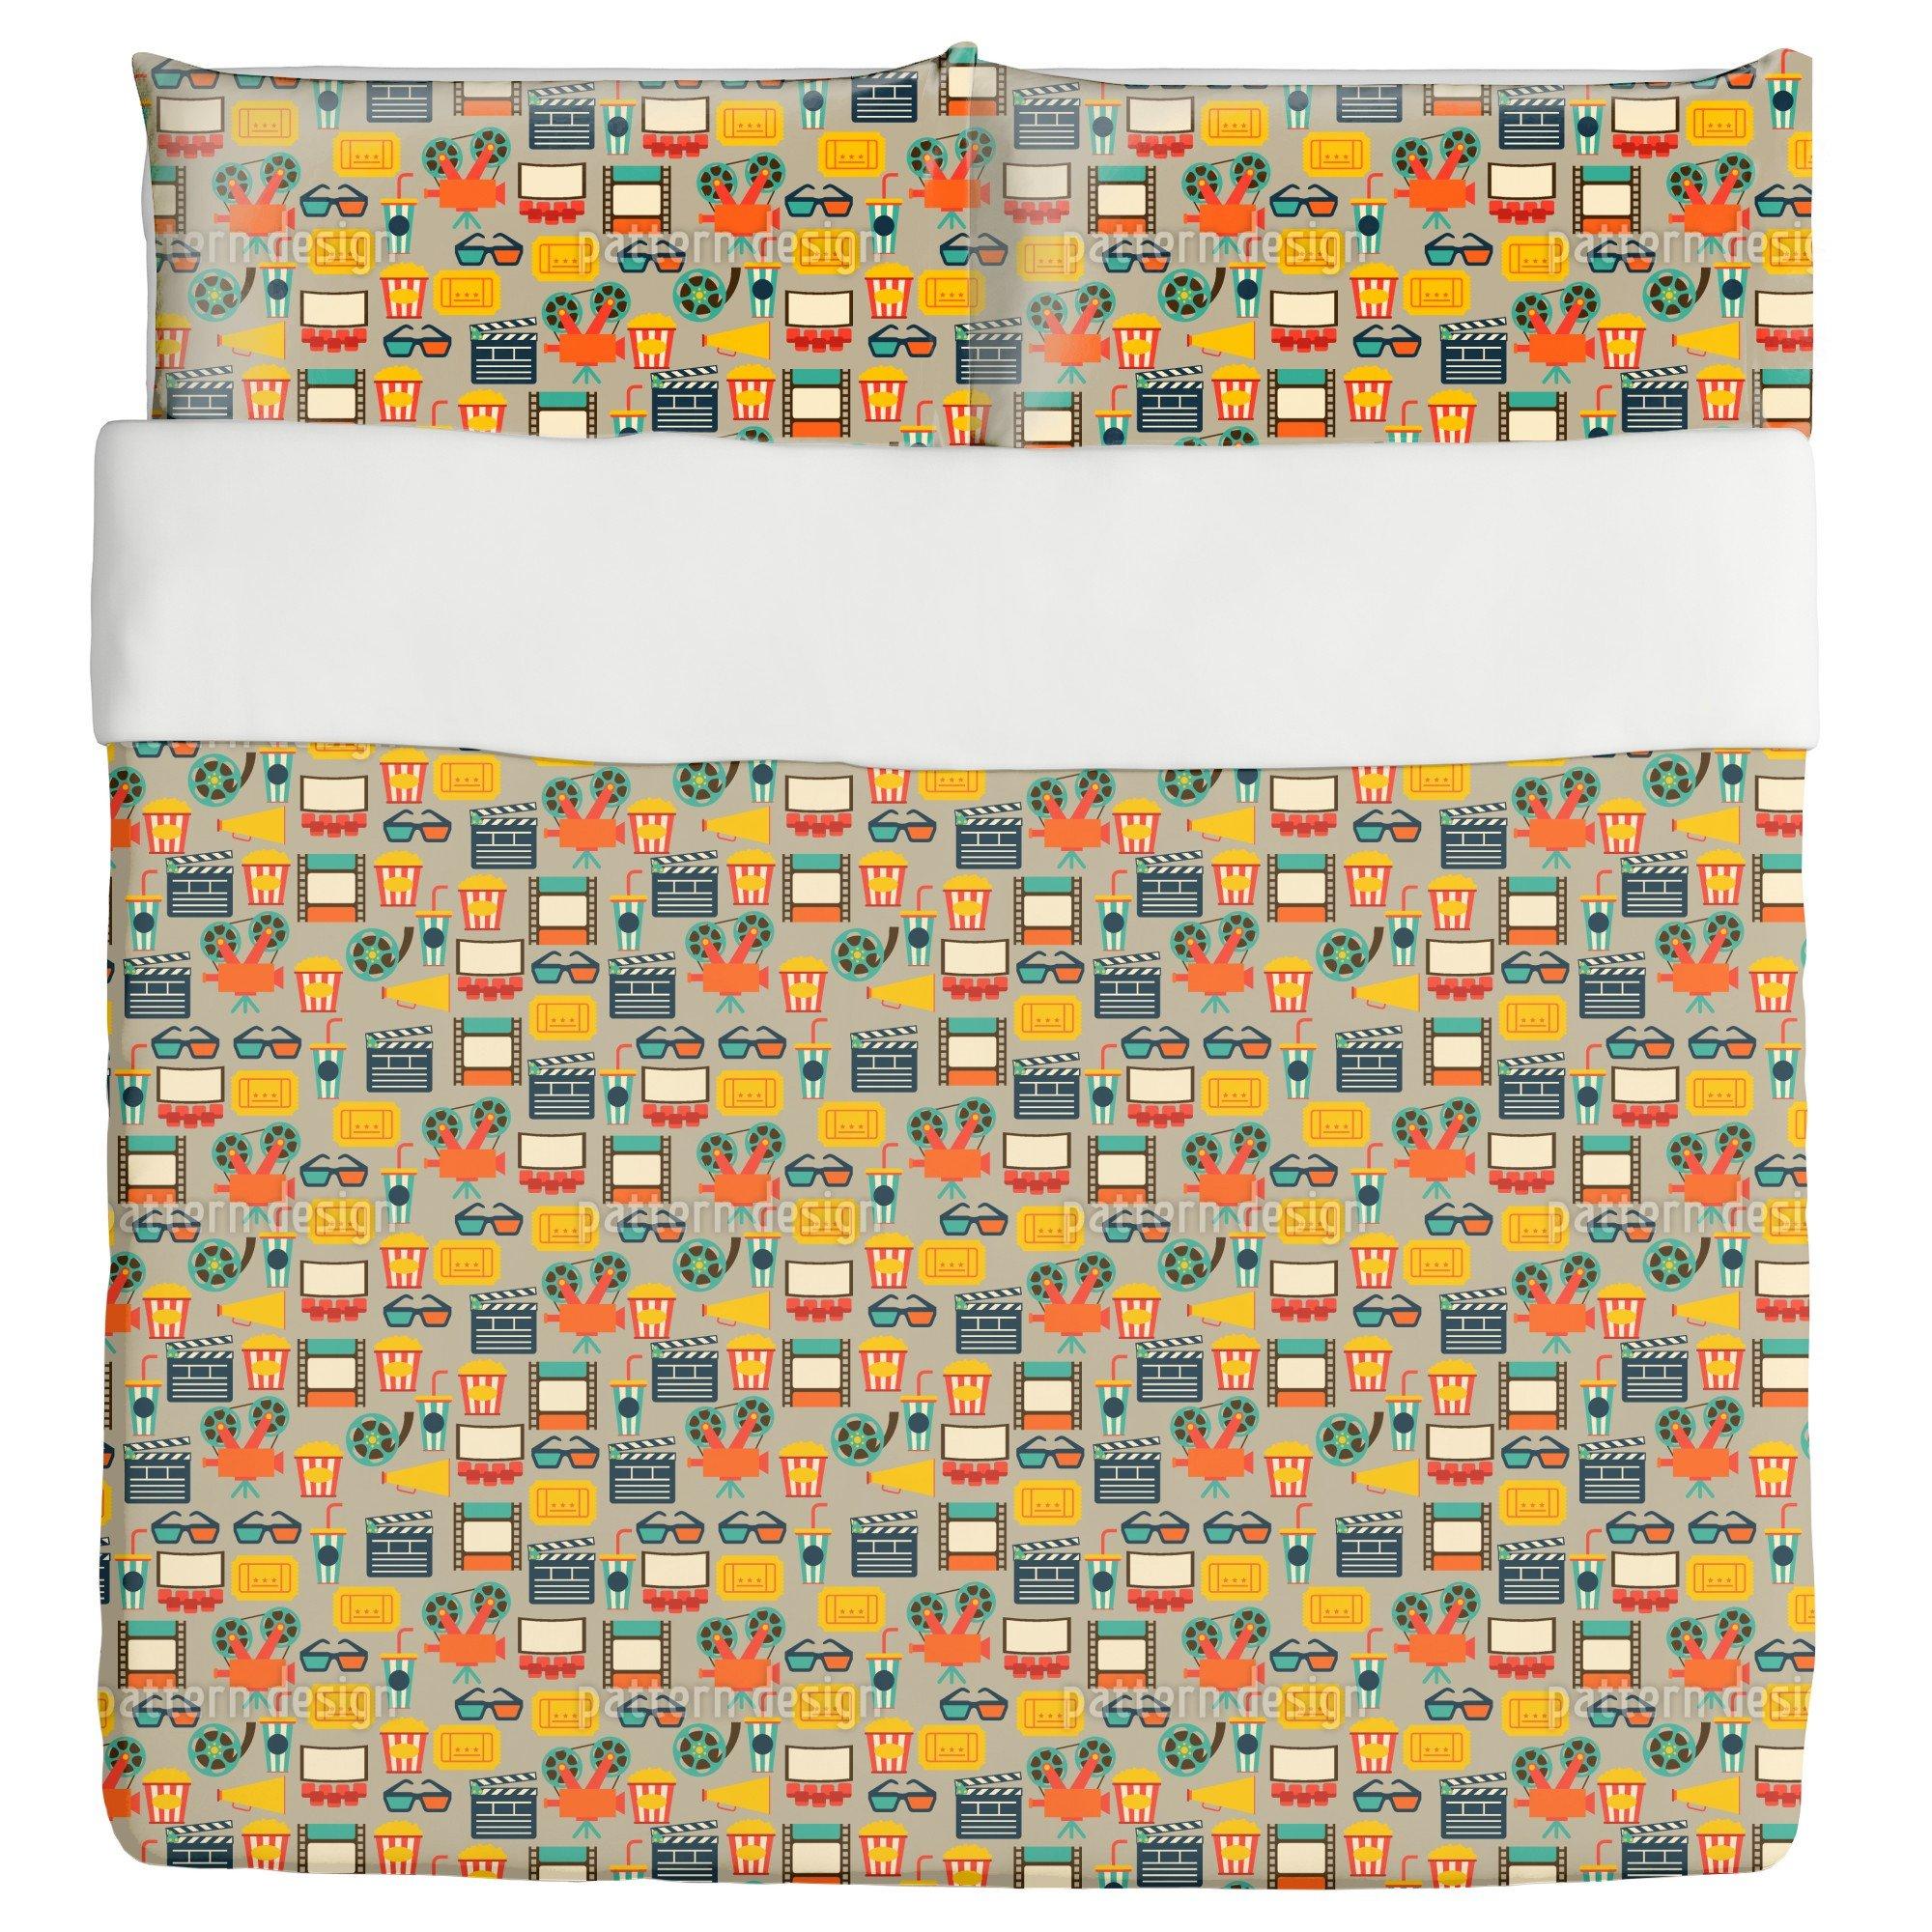 At The Cinema Duvet Bed Set 3 Piece Set Duvet Cover - 2 Pillow Shams - Luxury Microfiber, Soft, Breathable